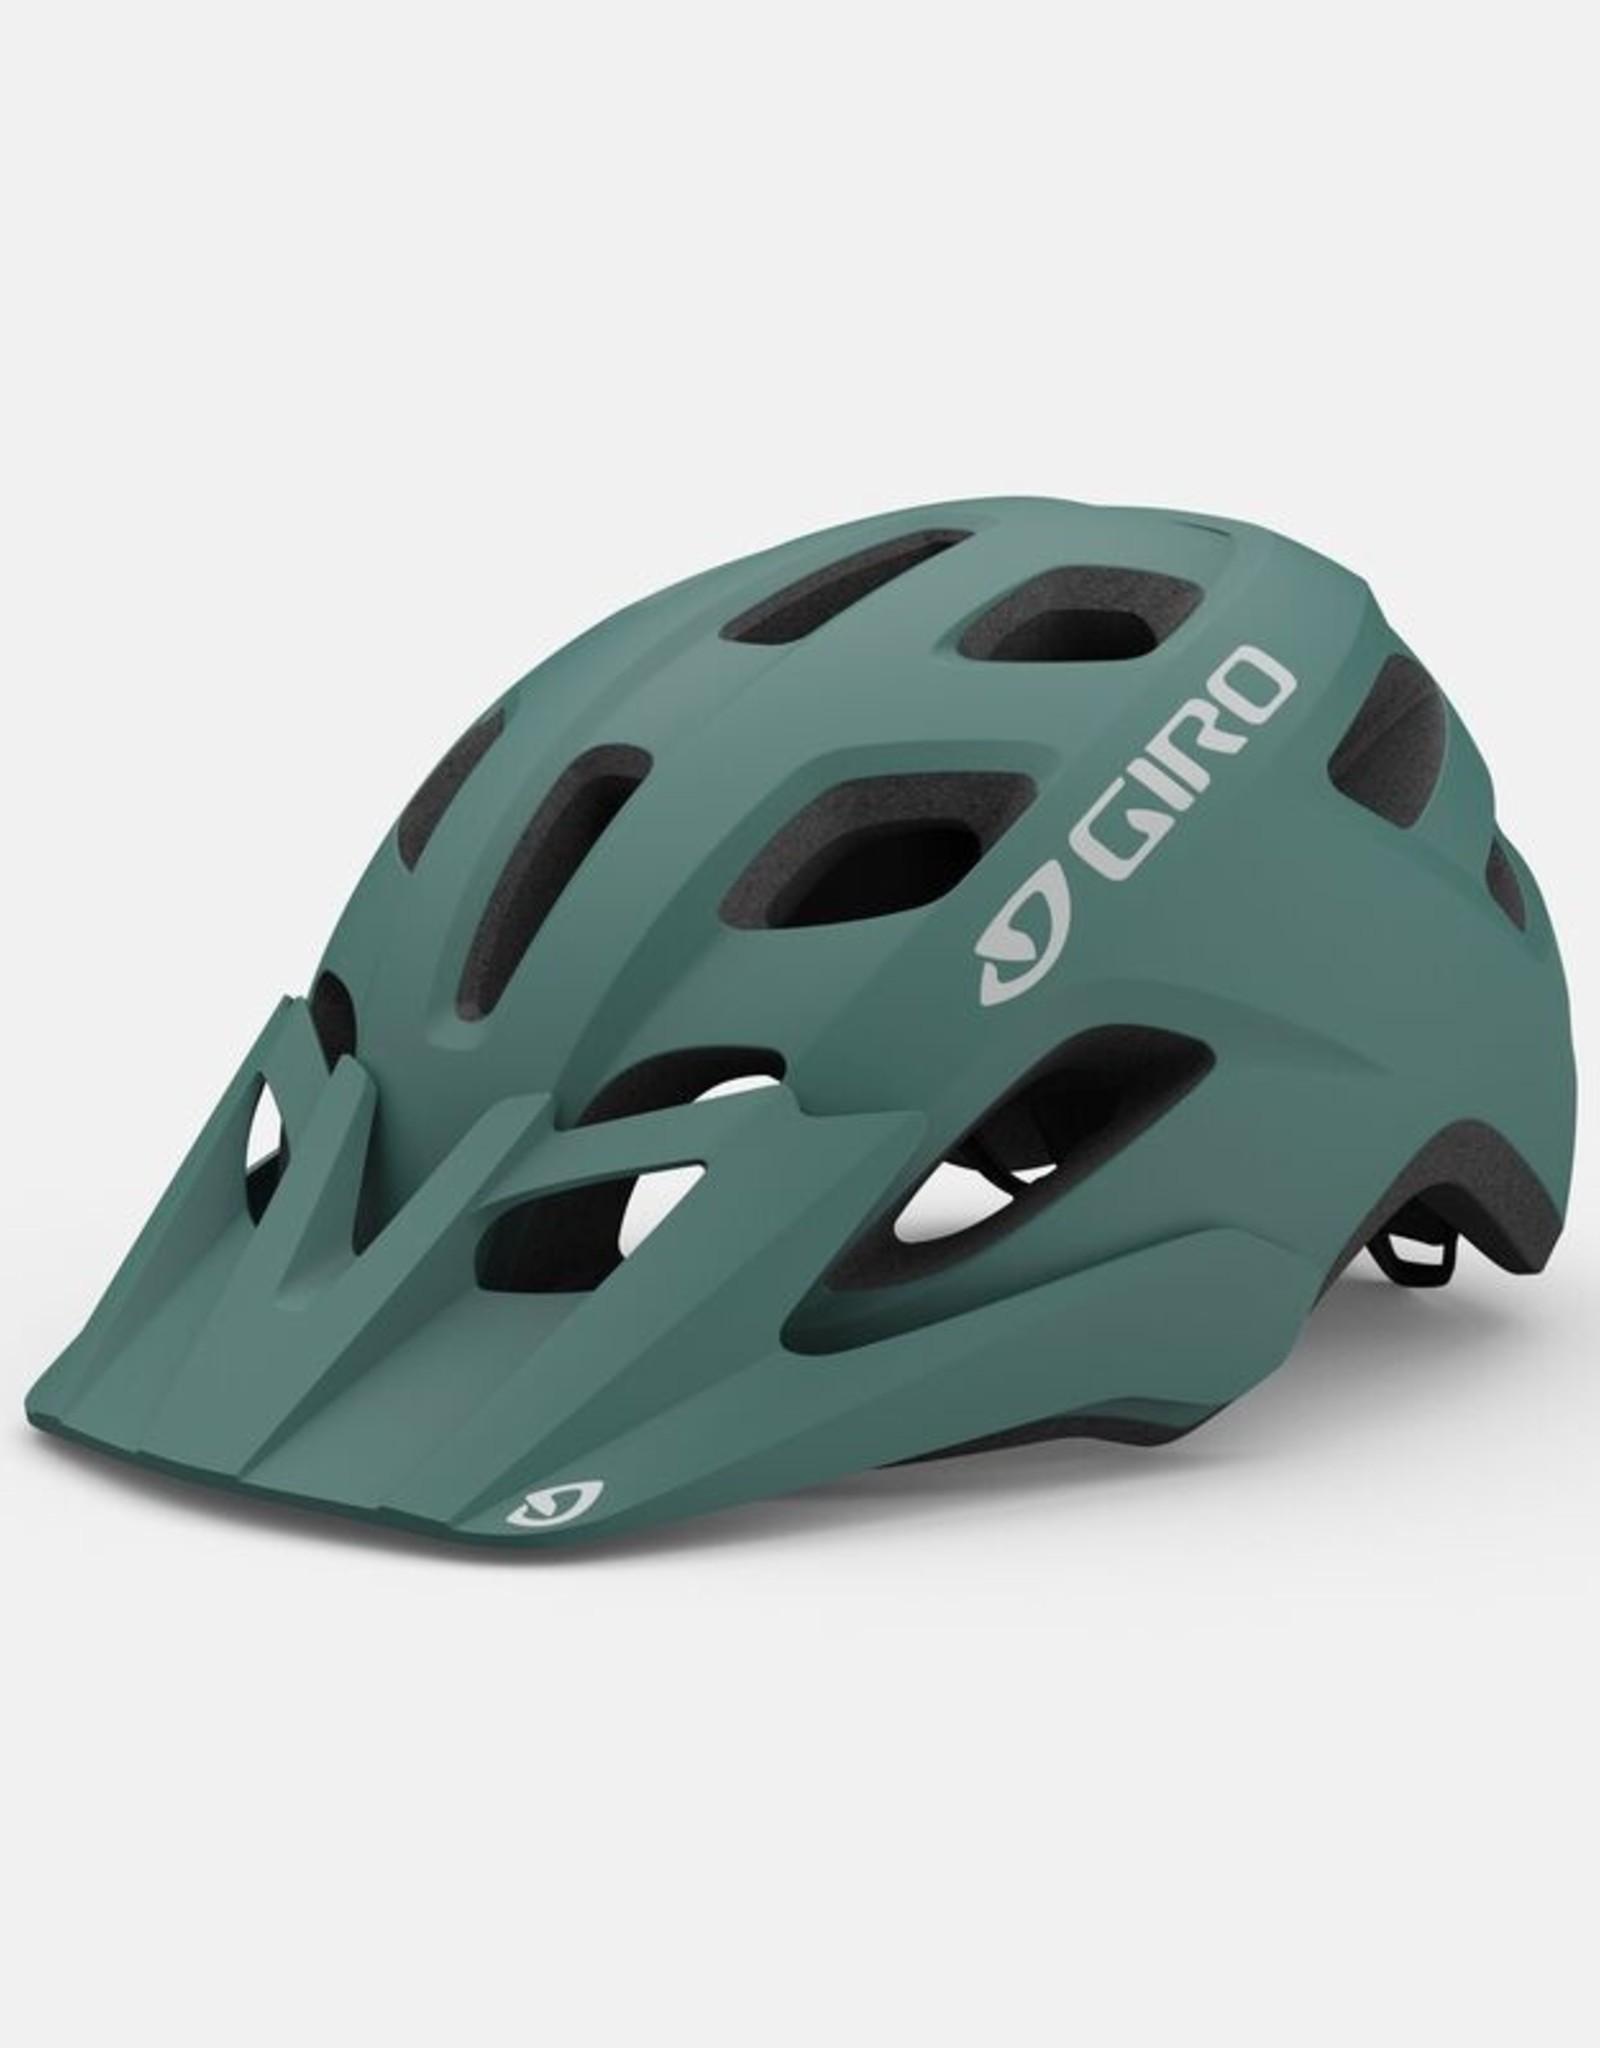 Giro Giro Fixture MIPS helmet